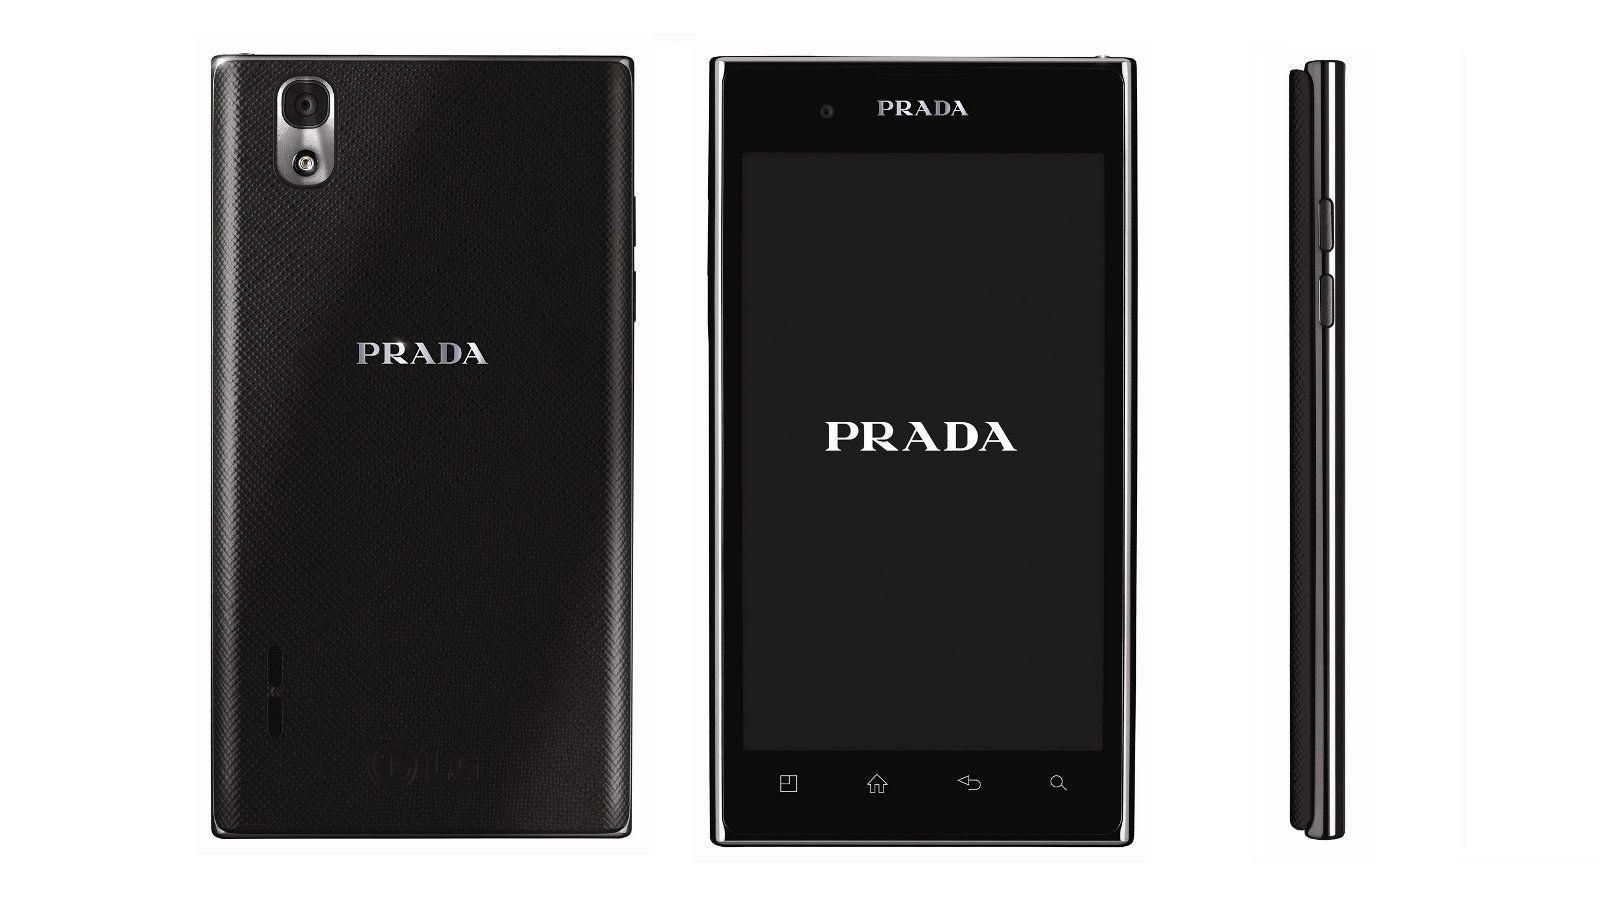 PRADA phone by LG 3.0 Mobile Phone news and reviews